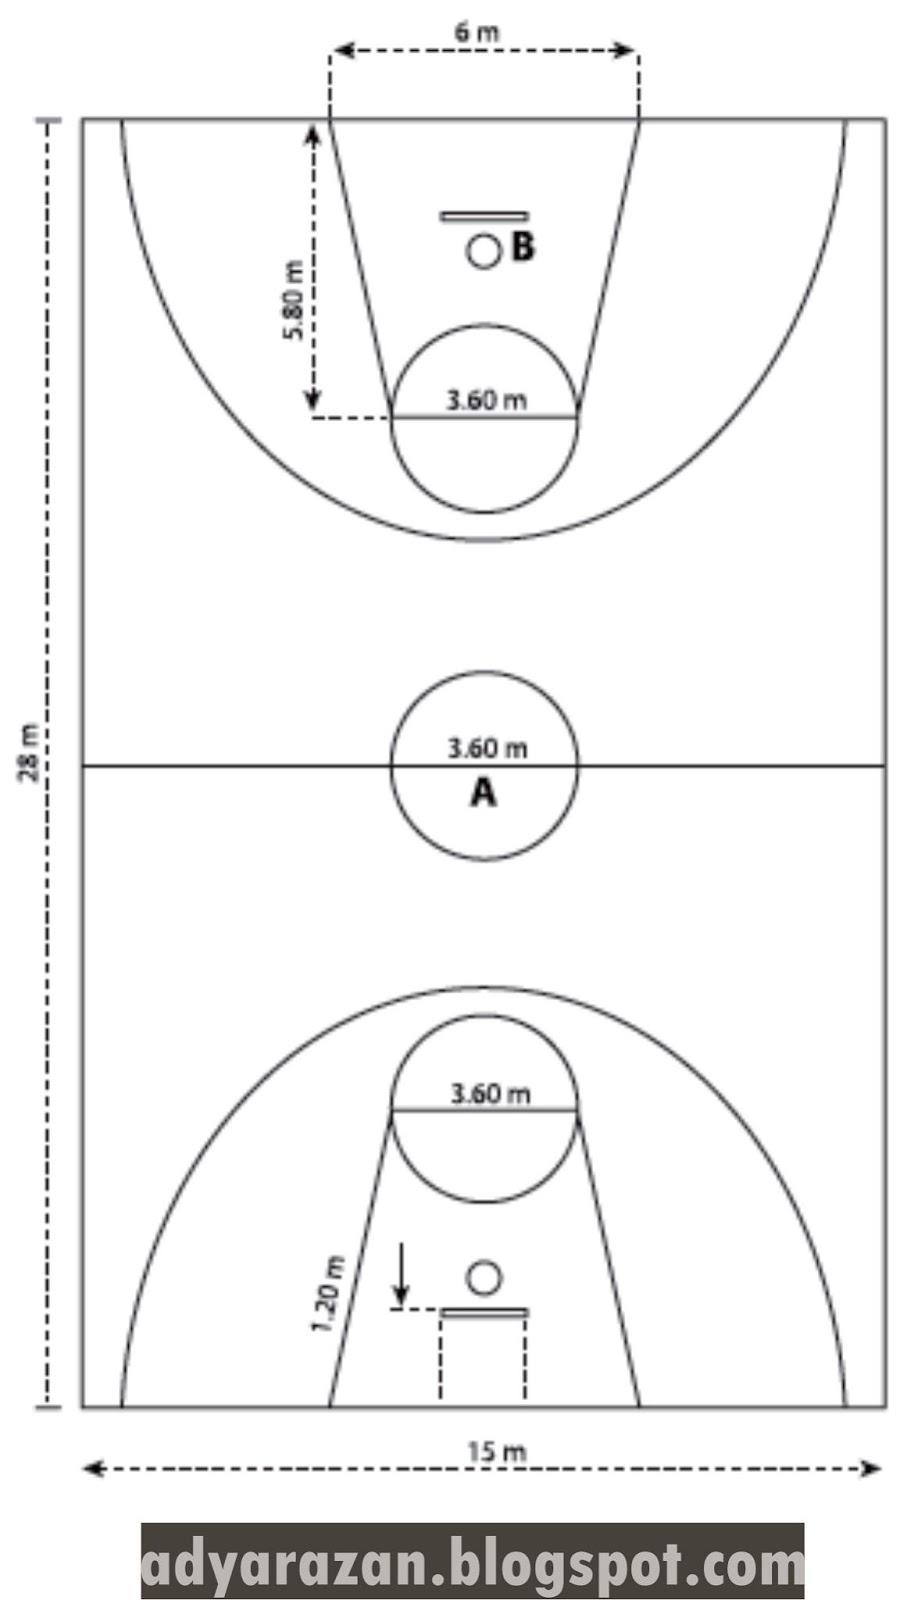 Ukuran Lapangan Basket Beserta Gambarnya Lengkap Adya Razan